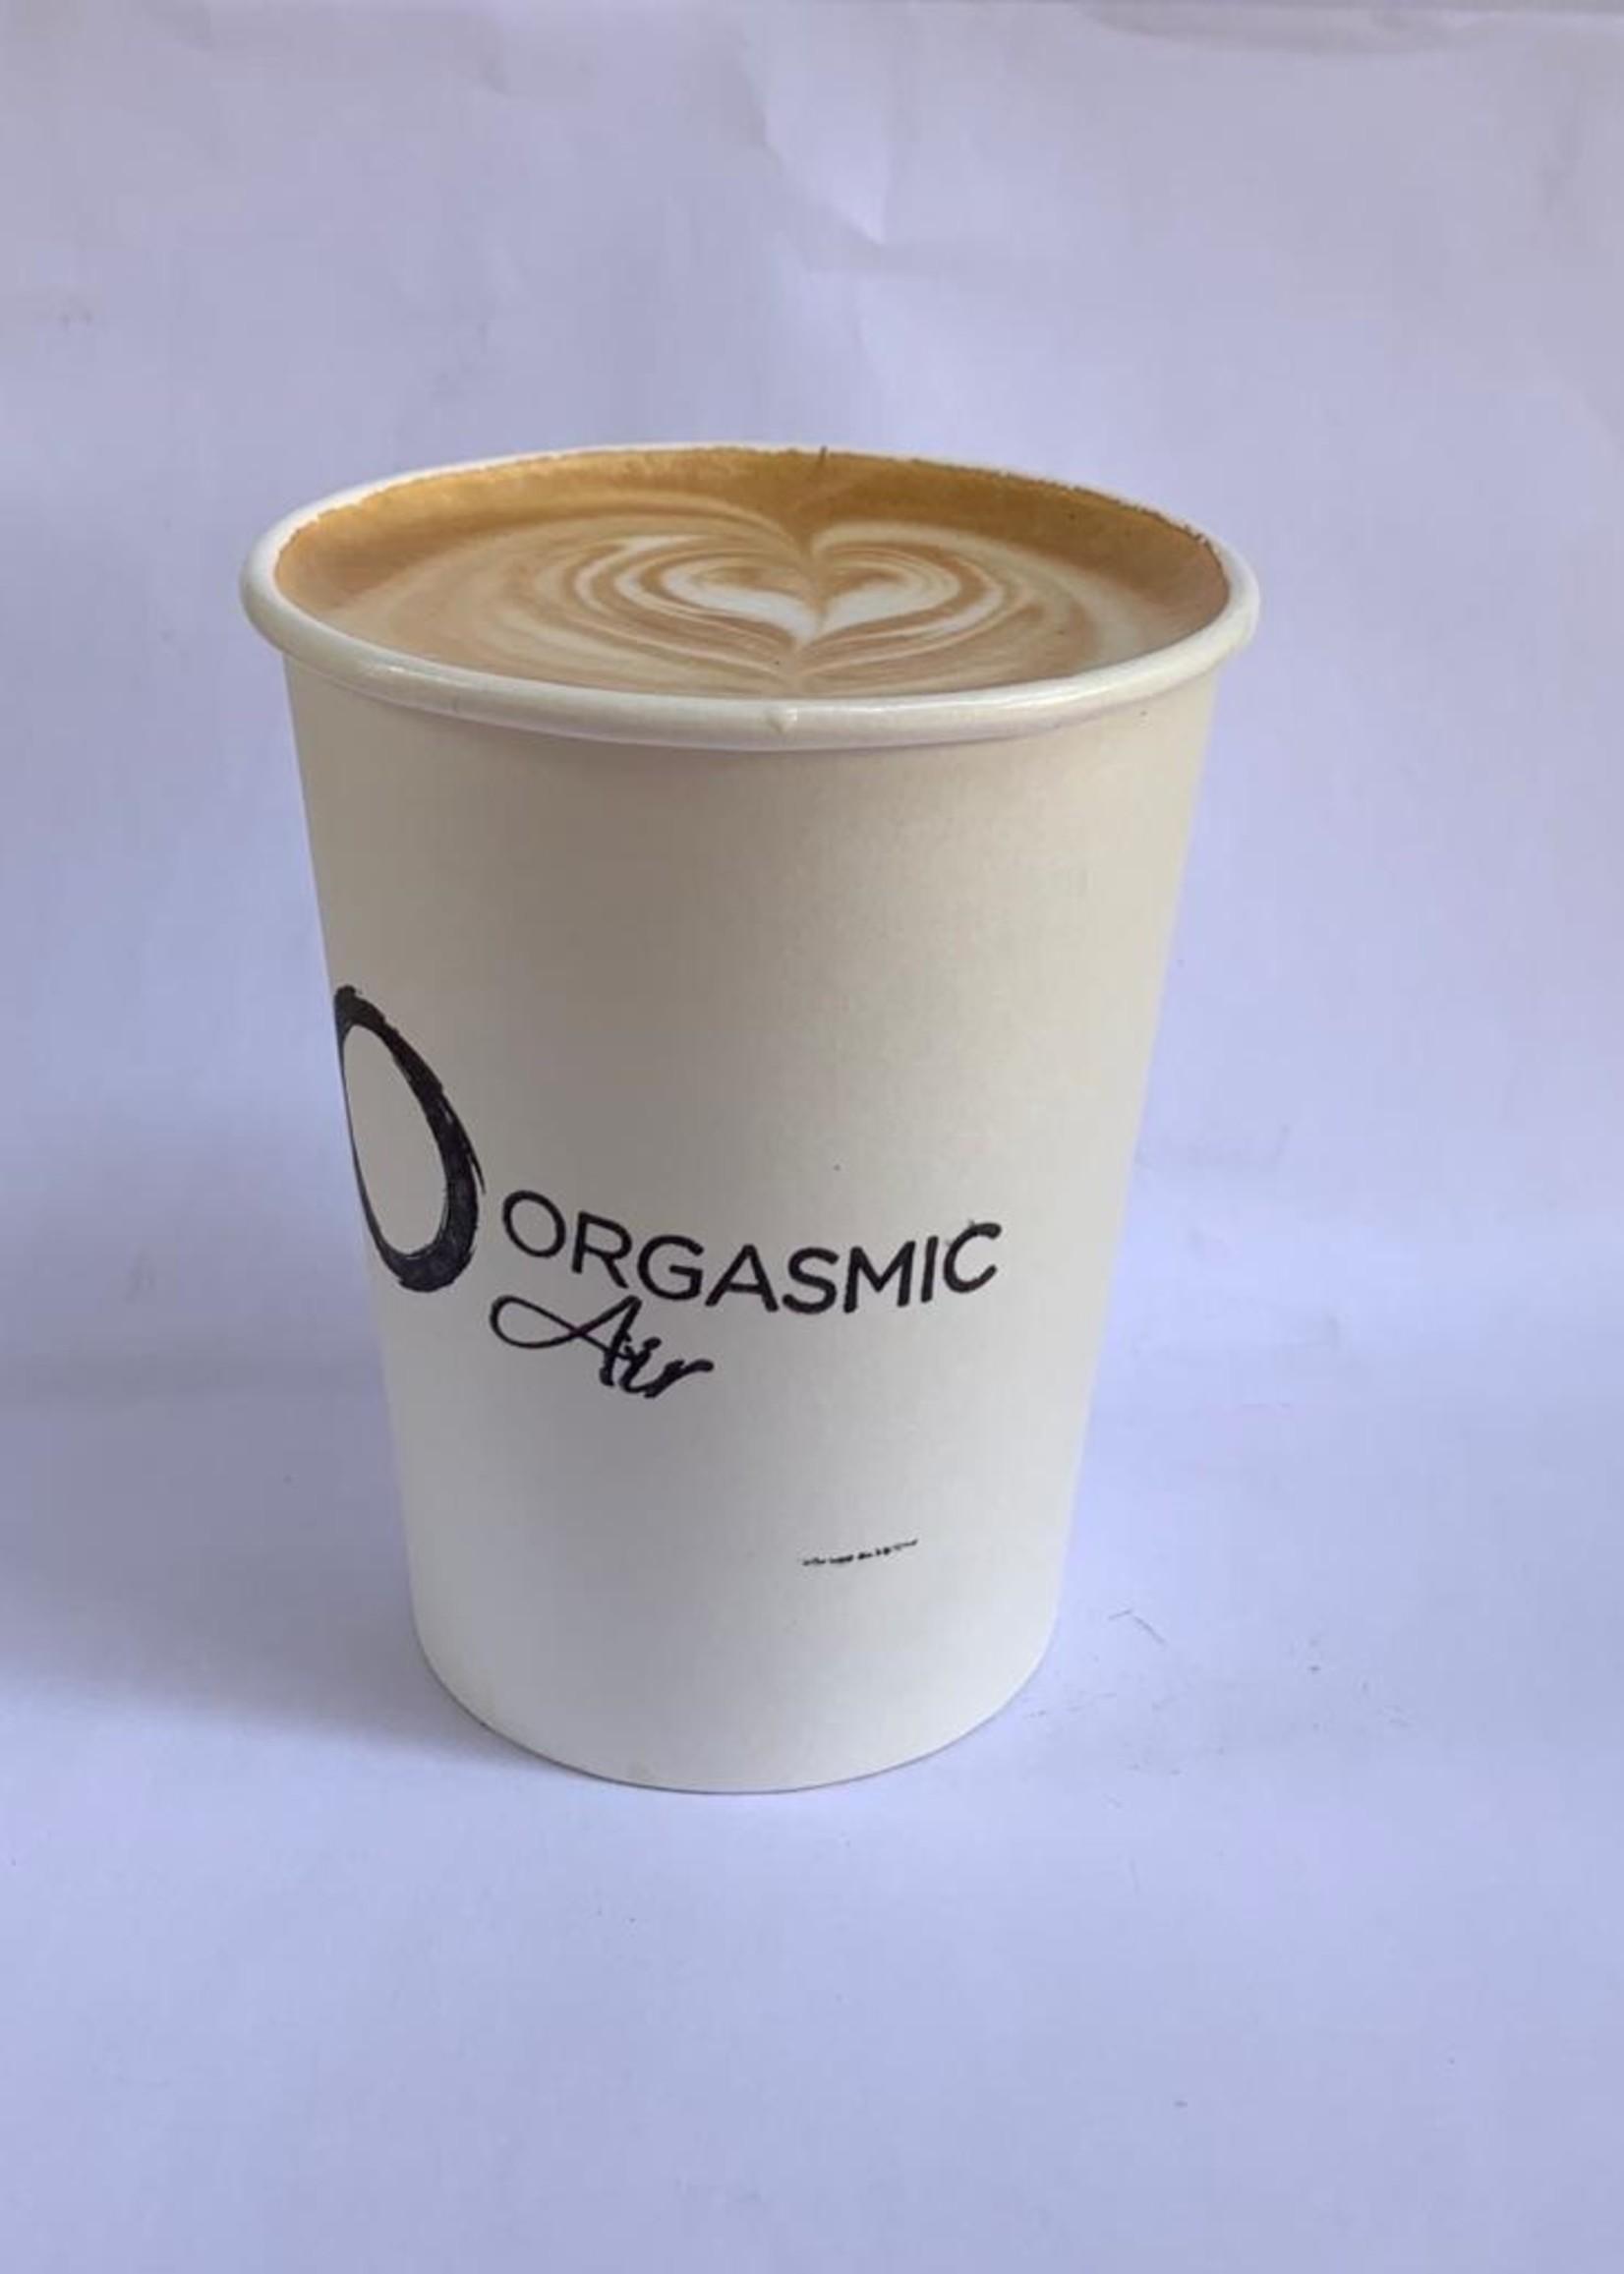 Organic & Air CBD infused hazelnut cappuccino